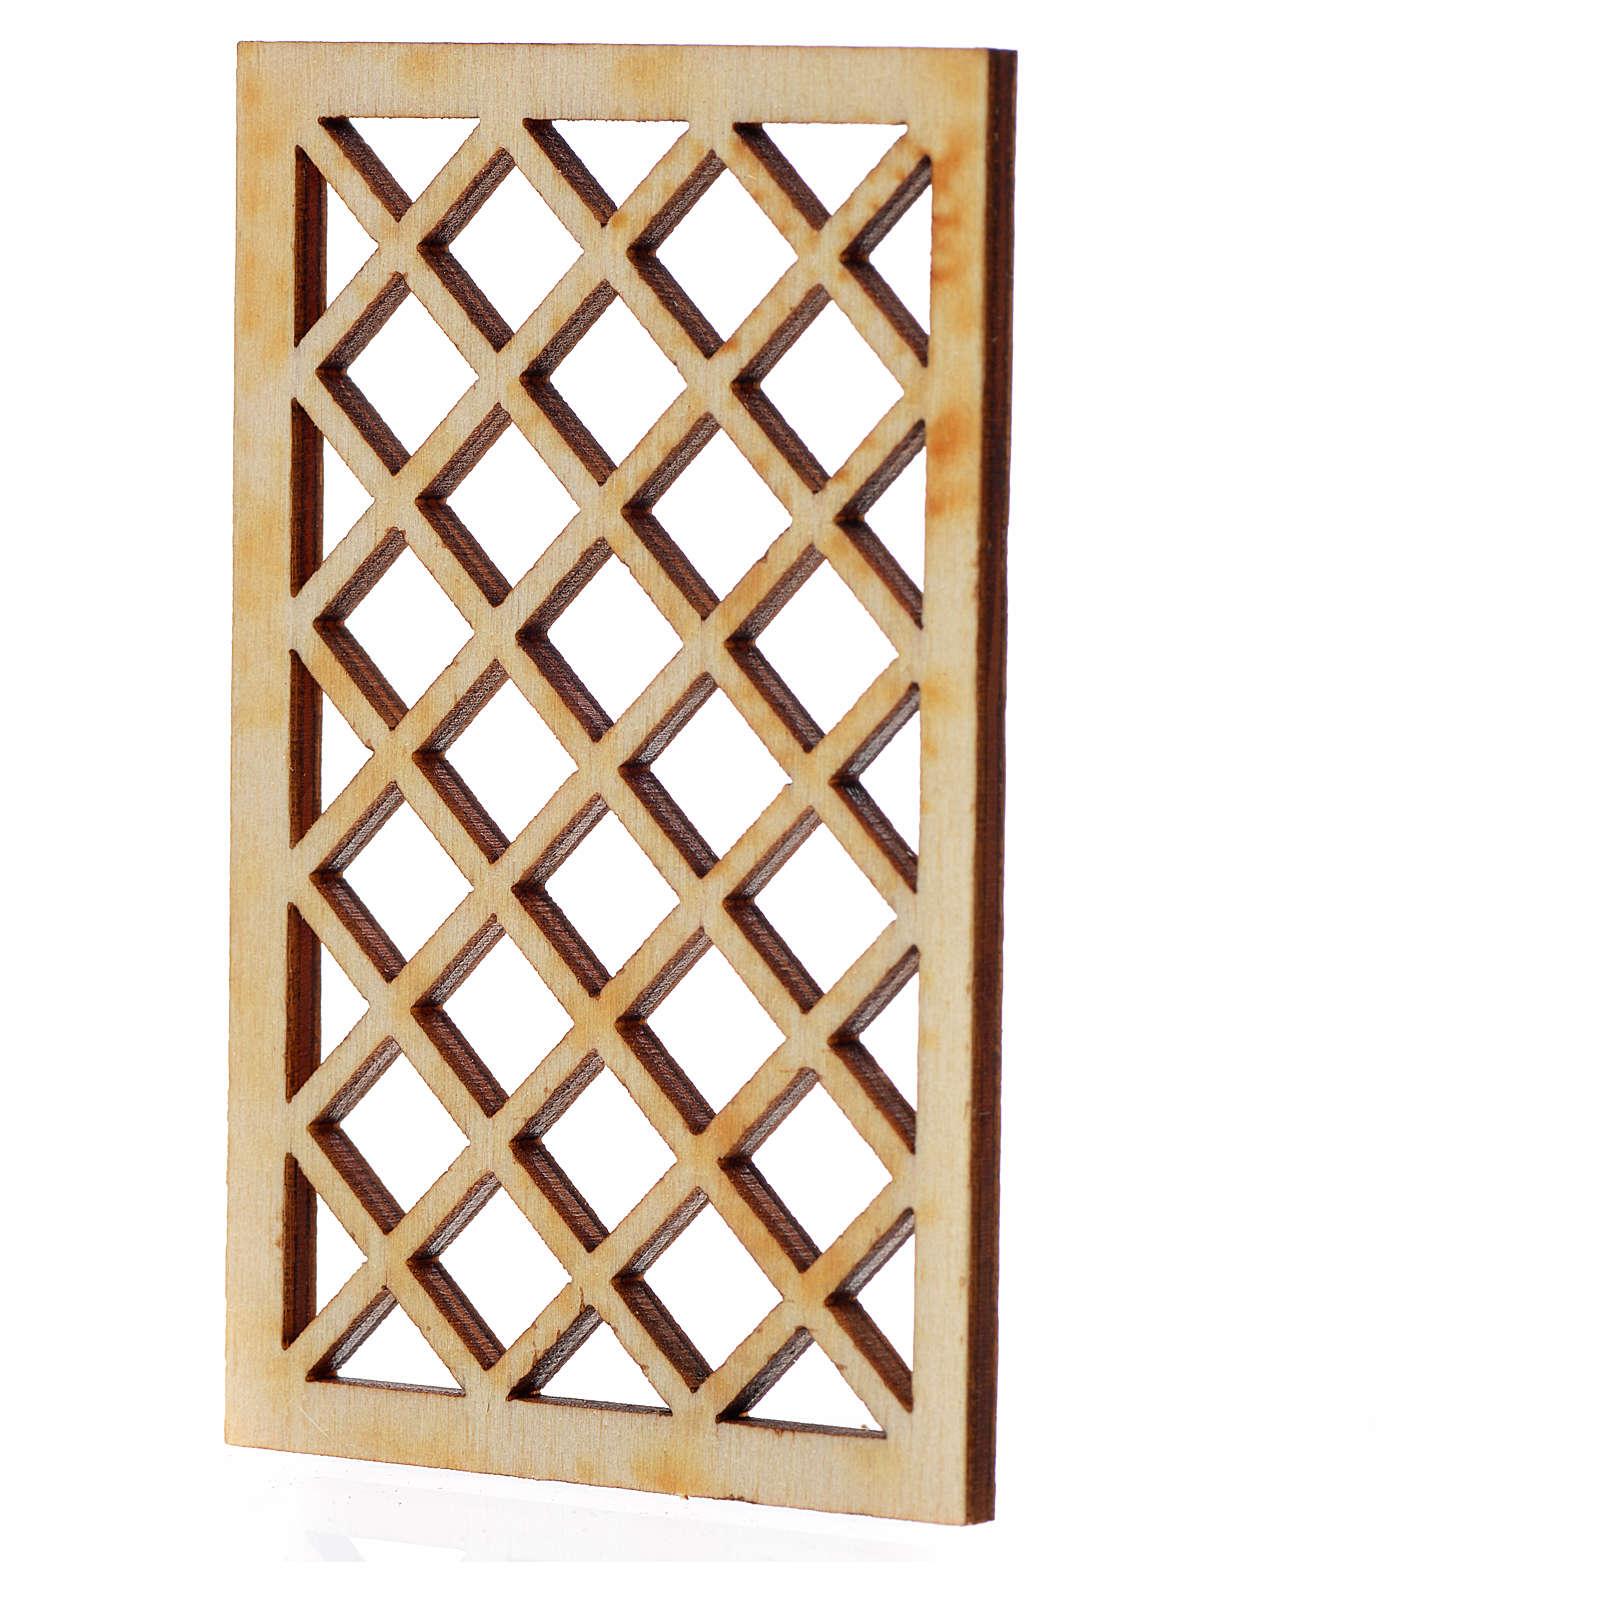 Nativity accessory, wooden bars 7x4.5cm 4